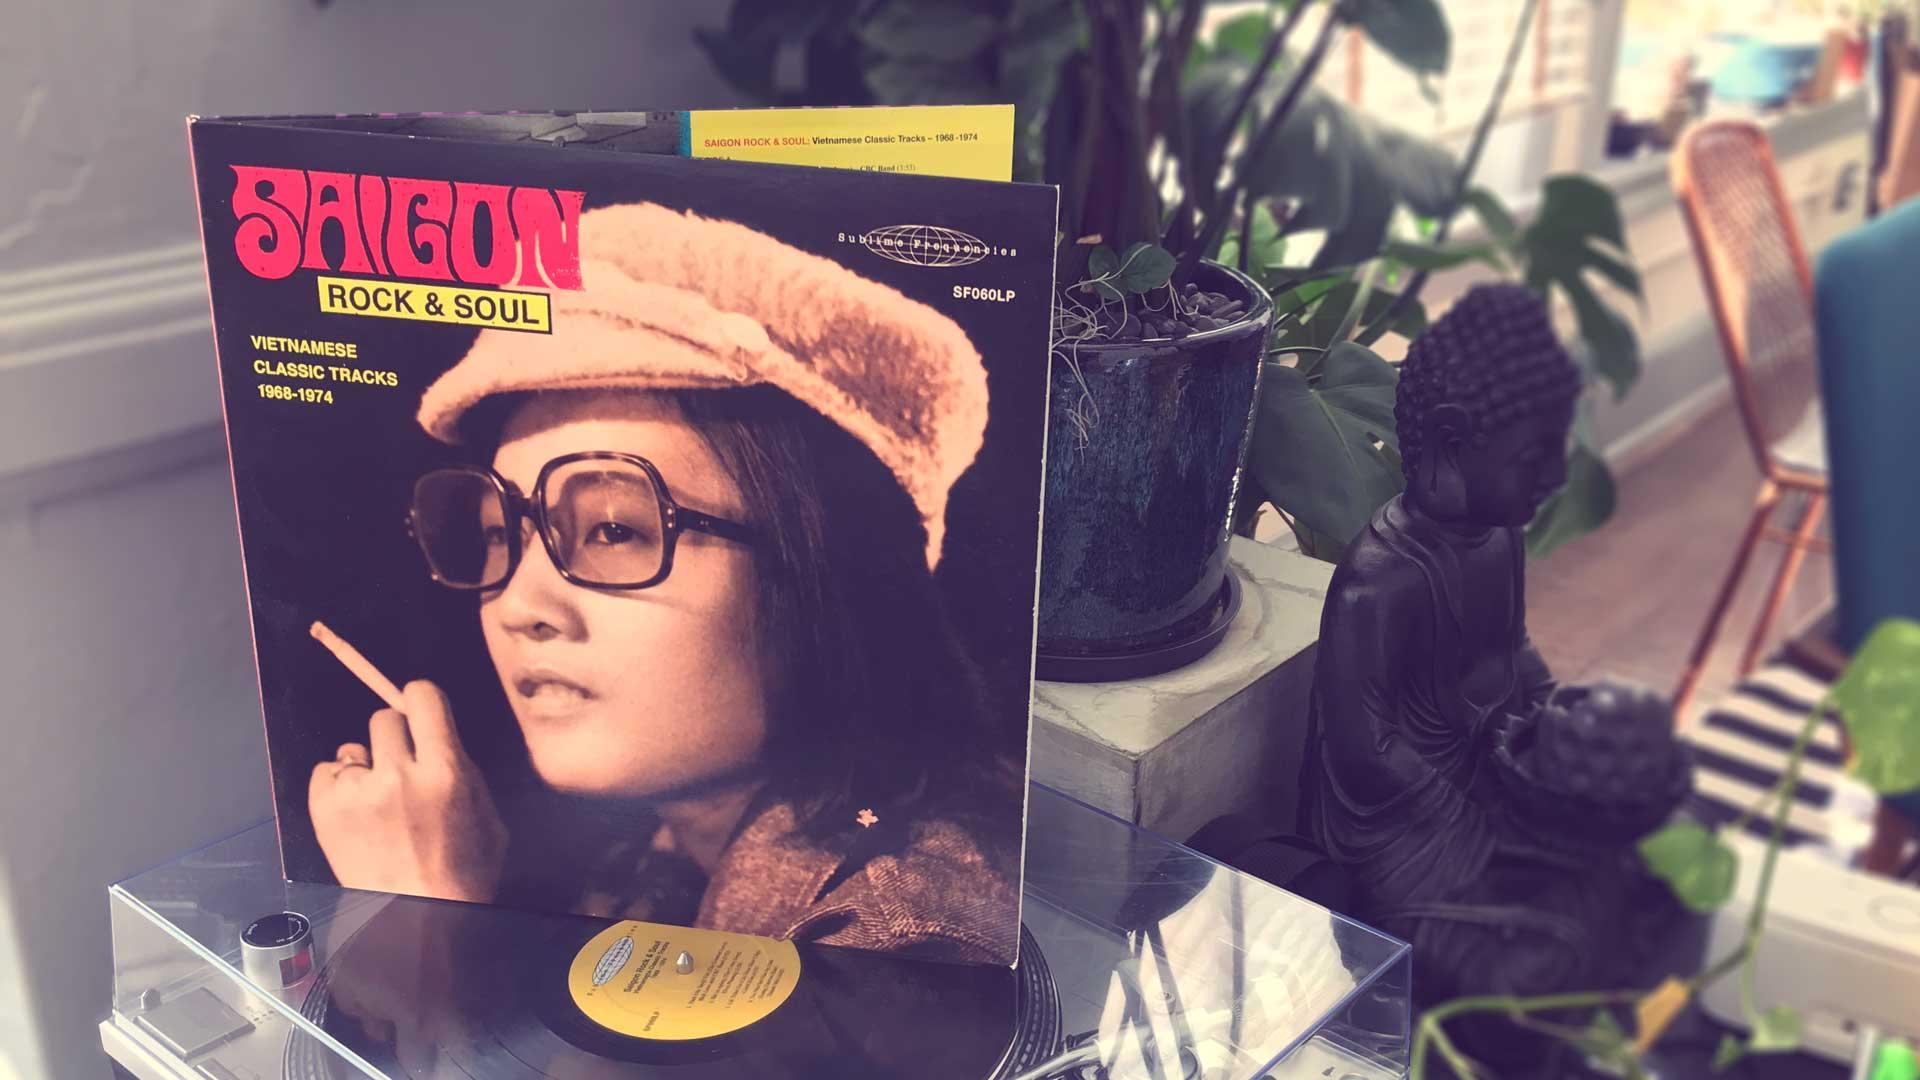 How Saigon Rock and Soul Inspired BAO